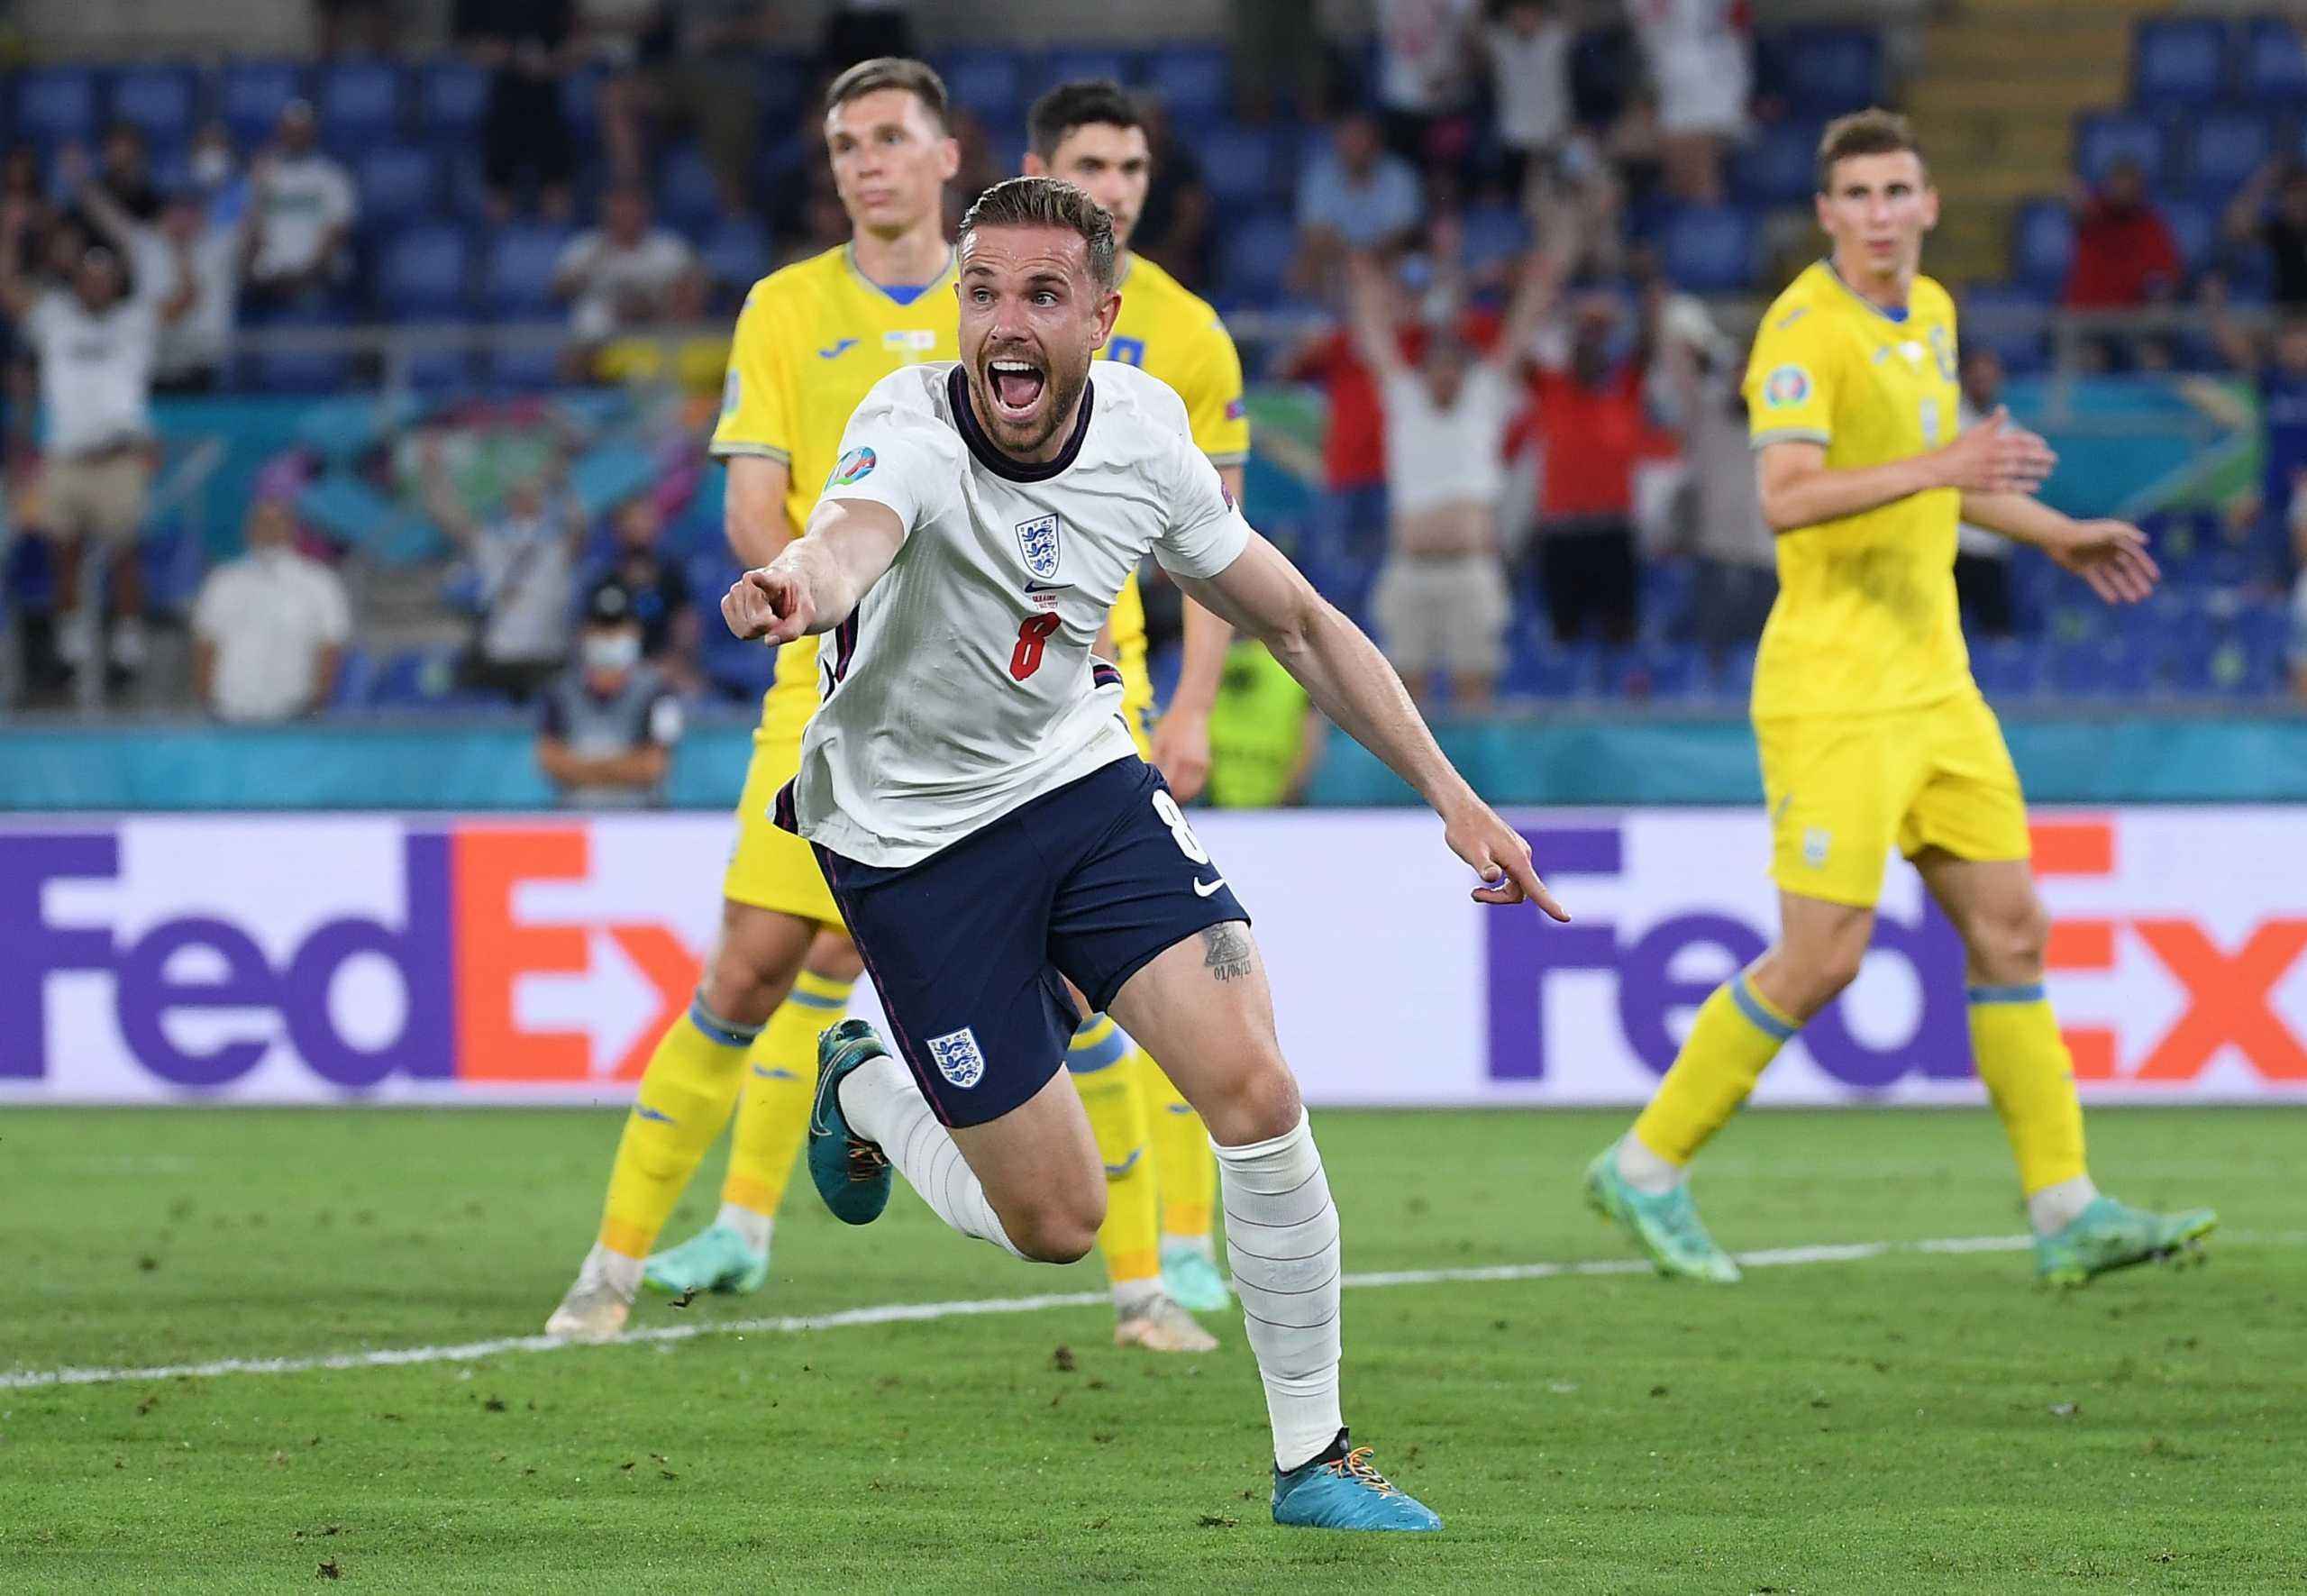 Euro 2020: Ασταμάτητη η Αγγλία πέτυχε και τέταρτο γκολ